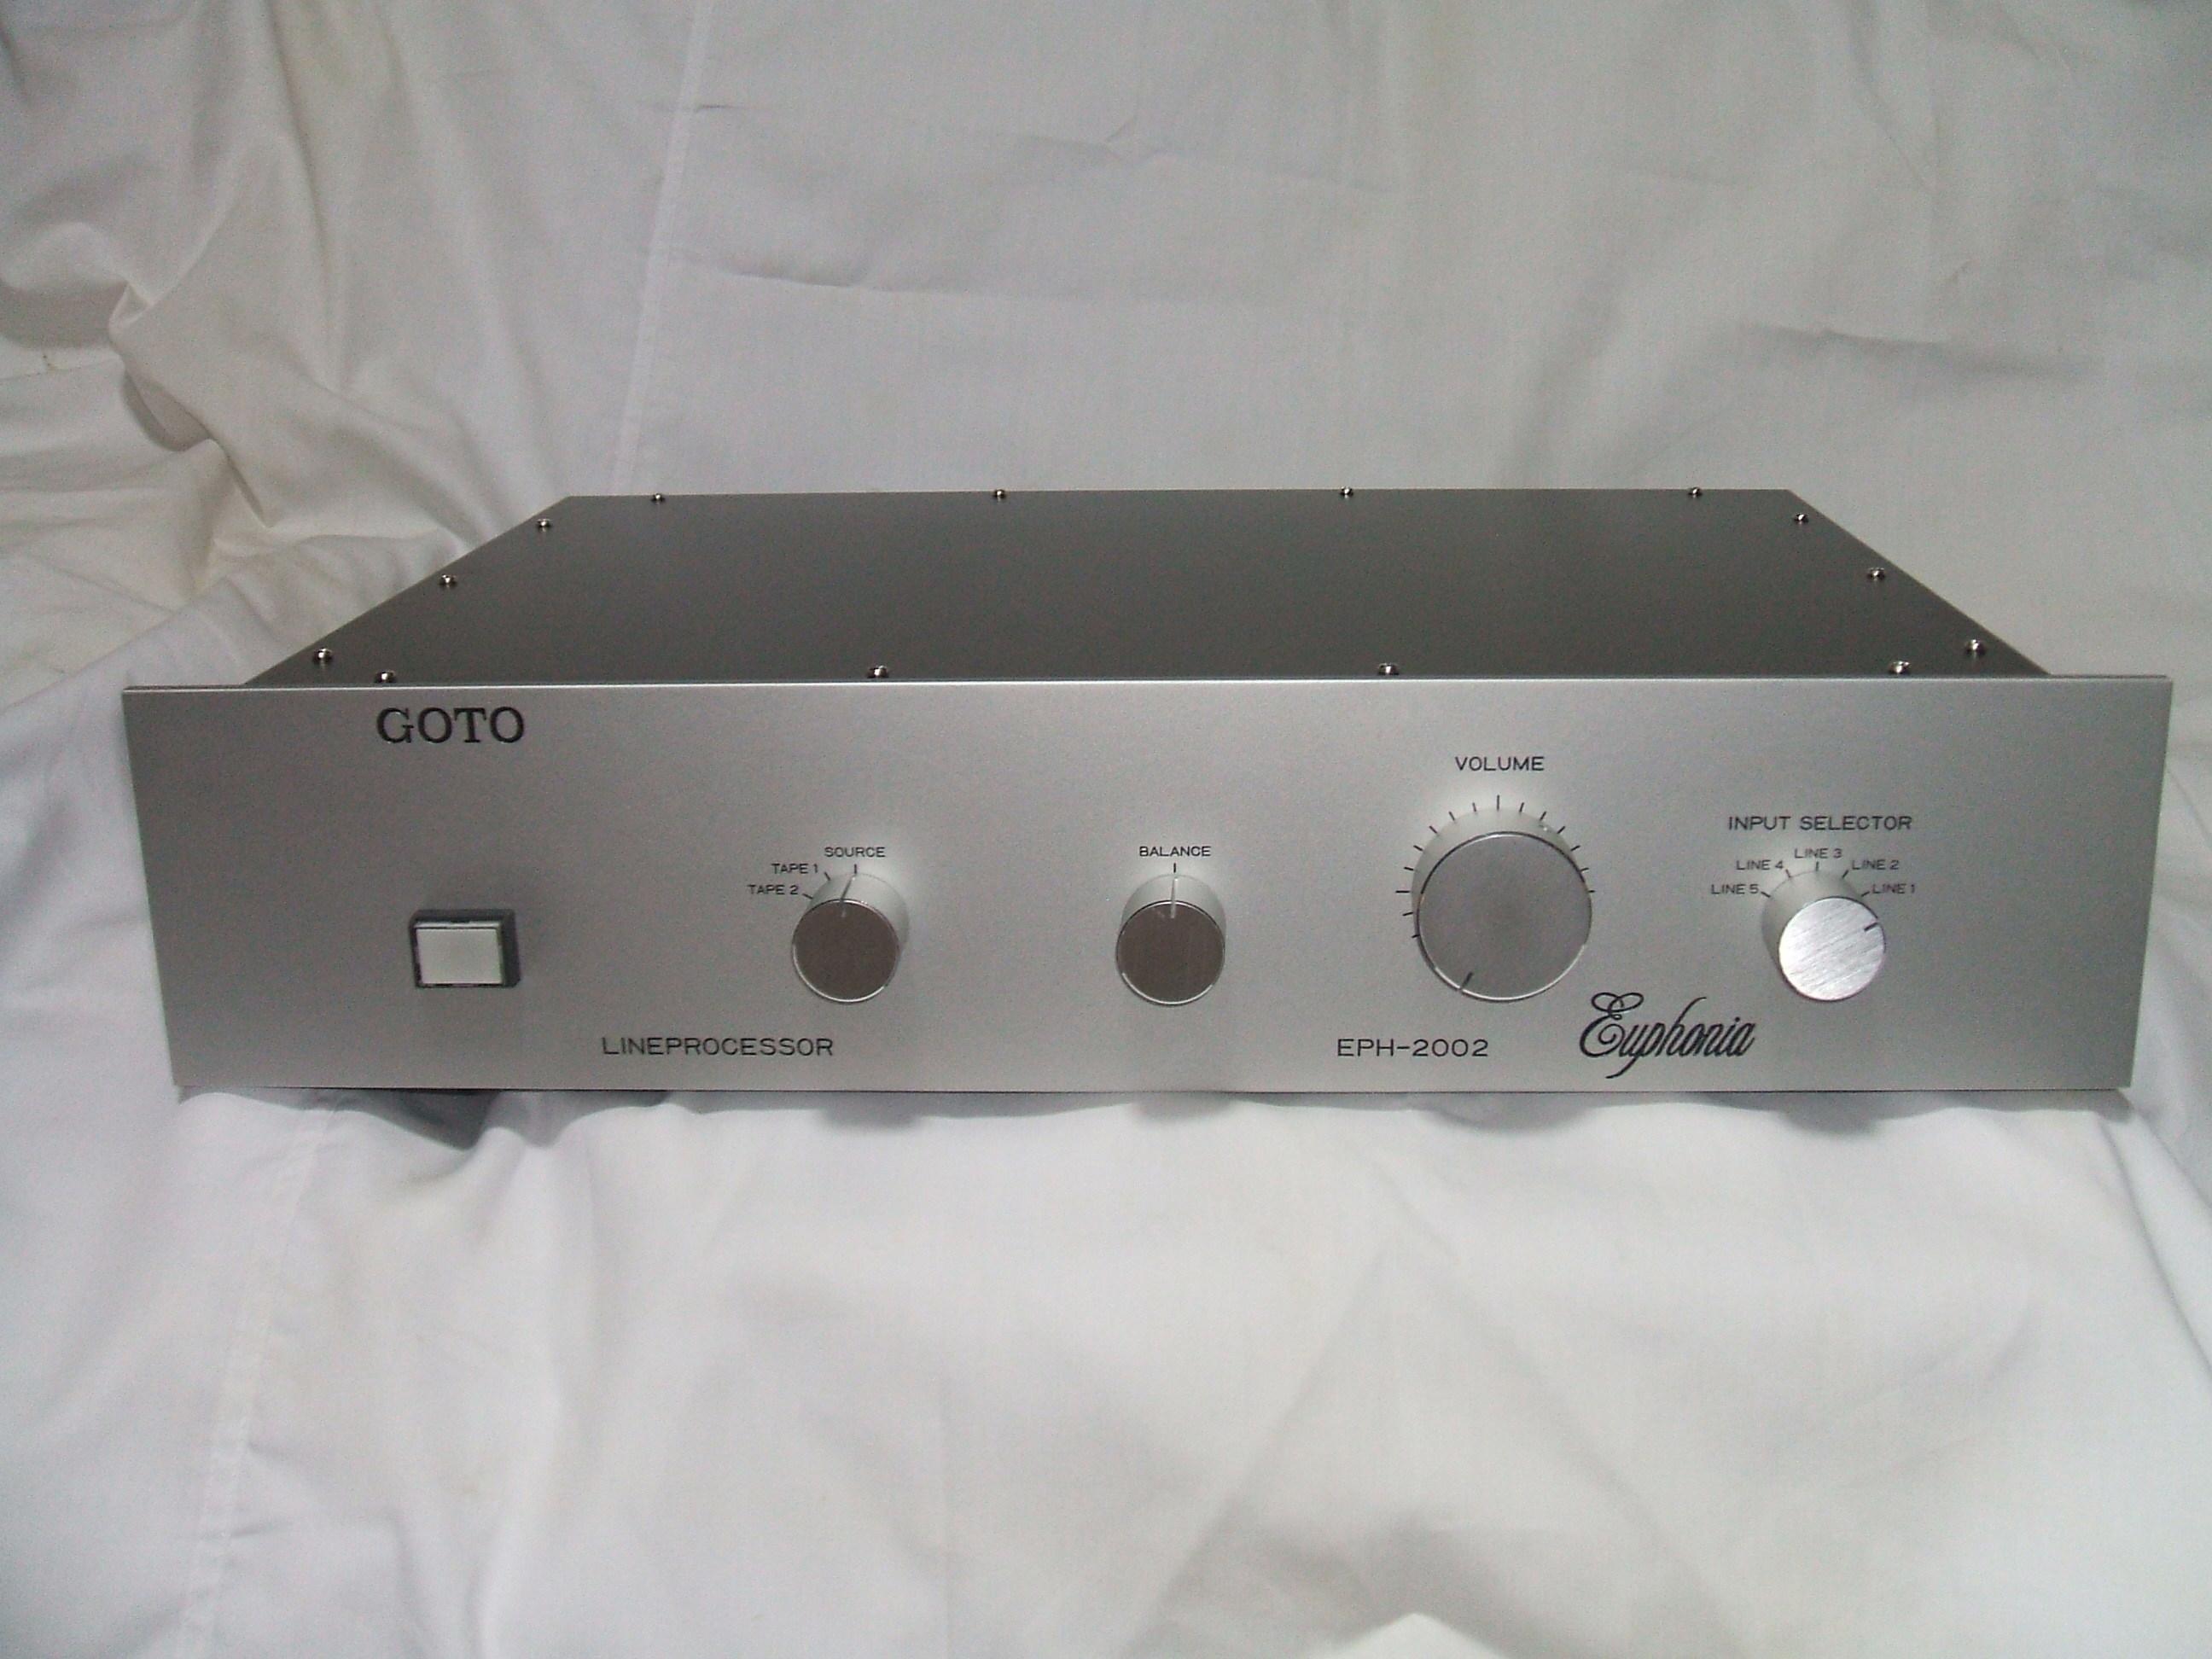 EPH-2002